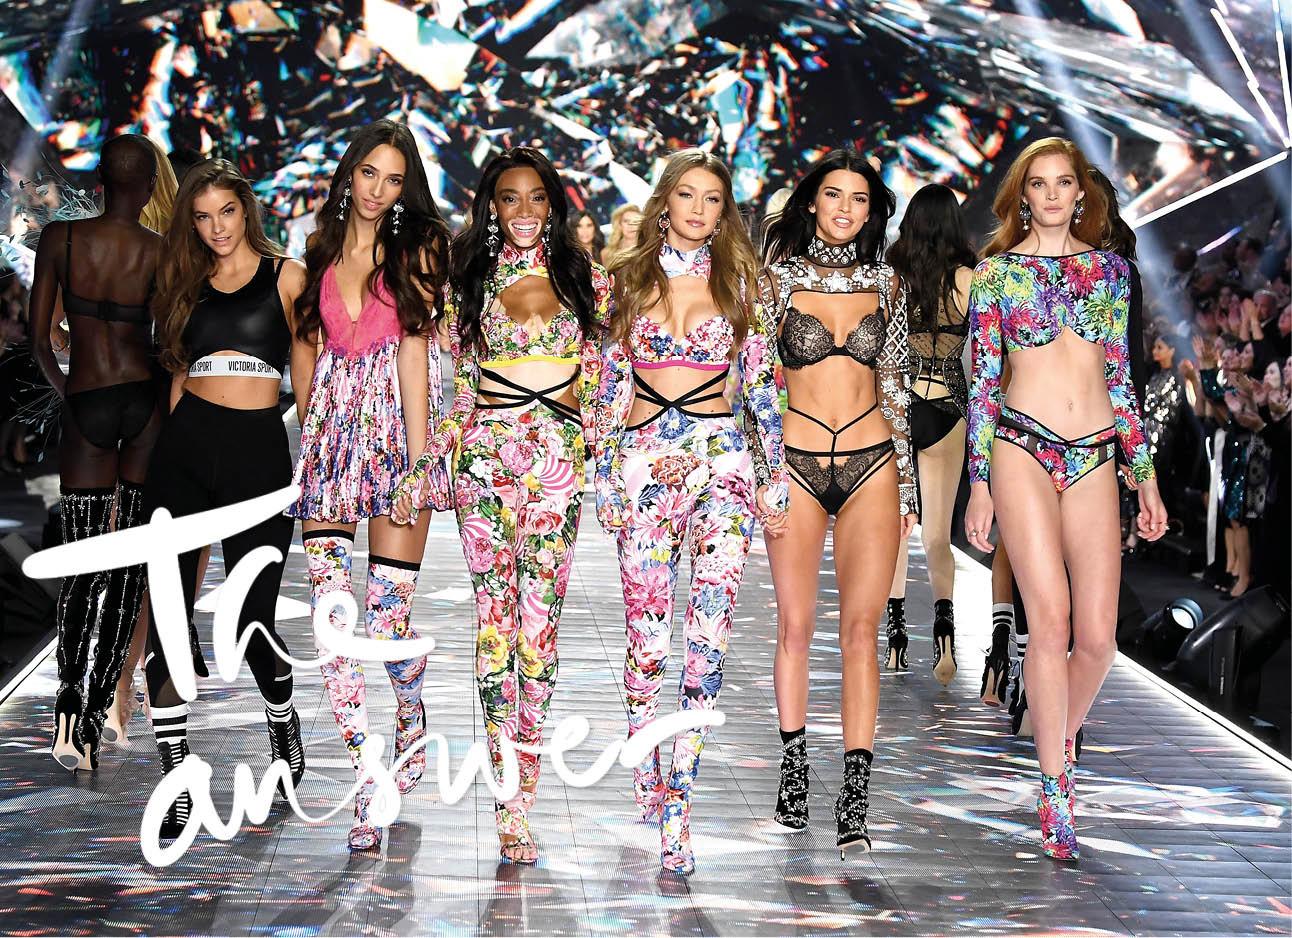 victoria secret show 2018 modellen op de catwalk